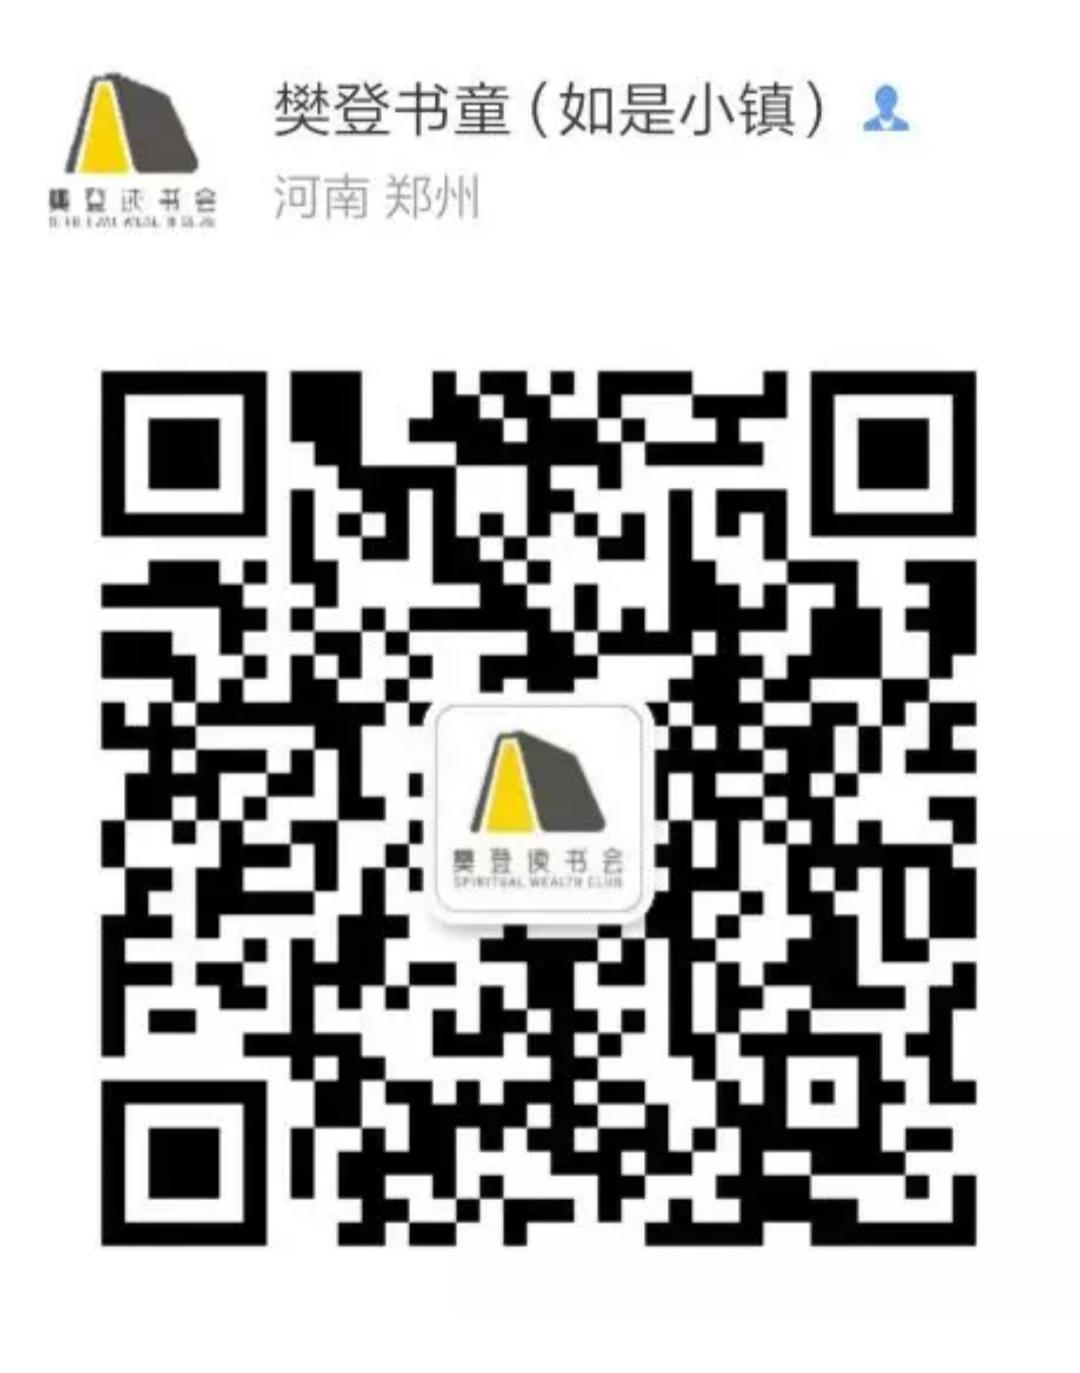 http://www.huodongxing.com/file/20190411/4113387473647/633427985263618.png